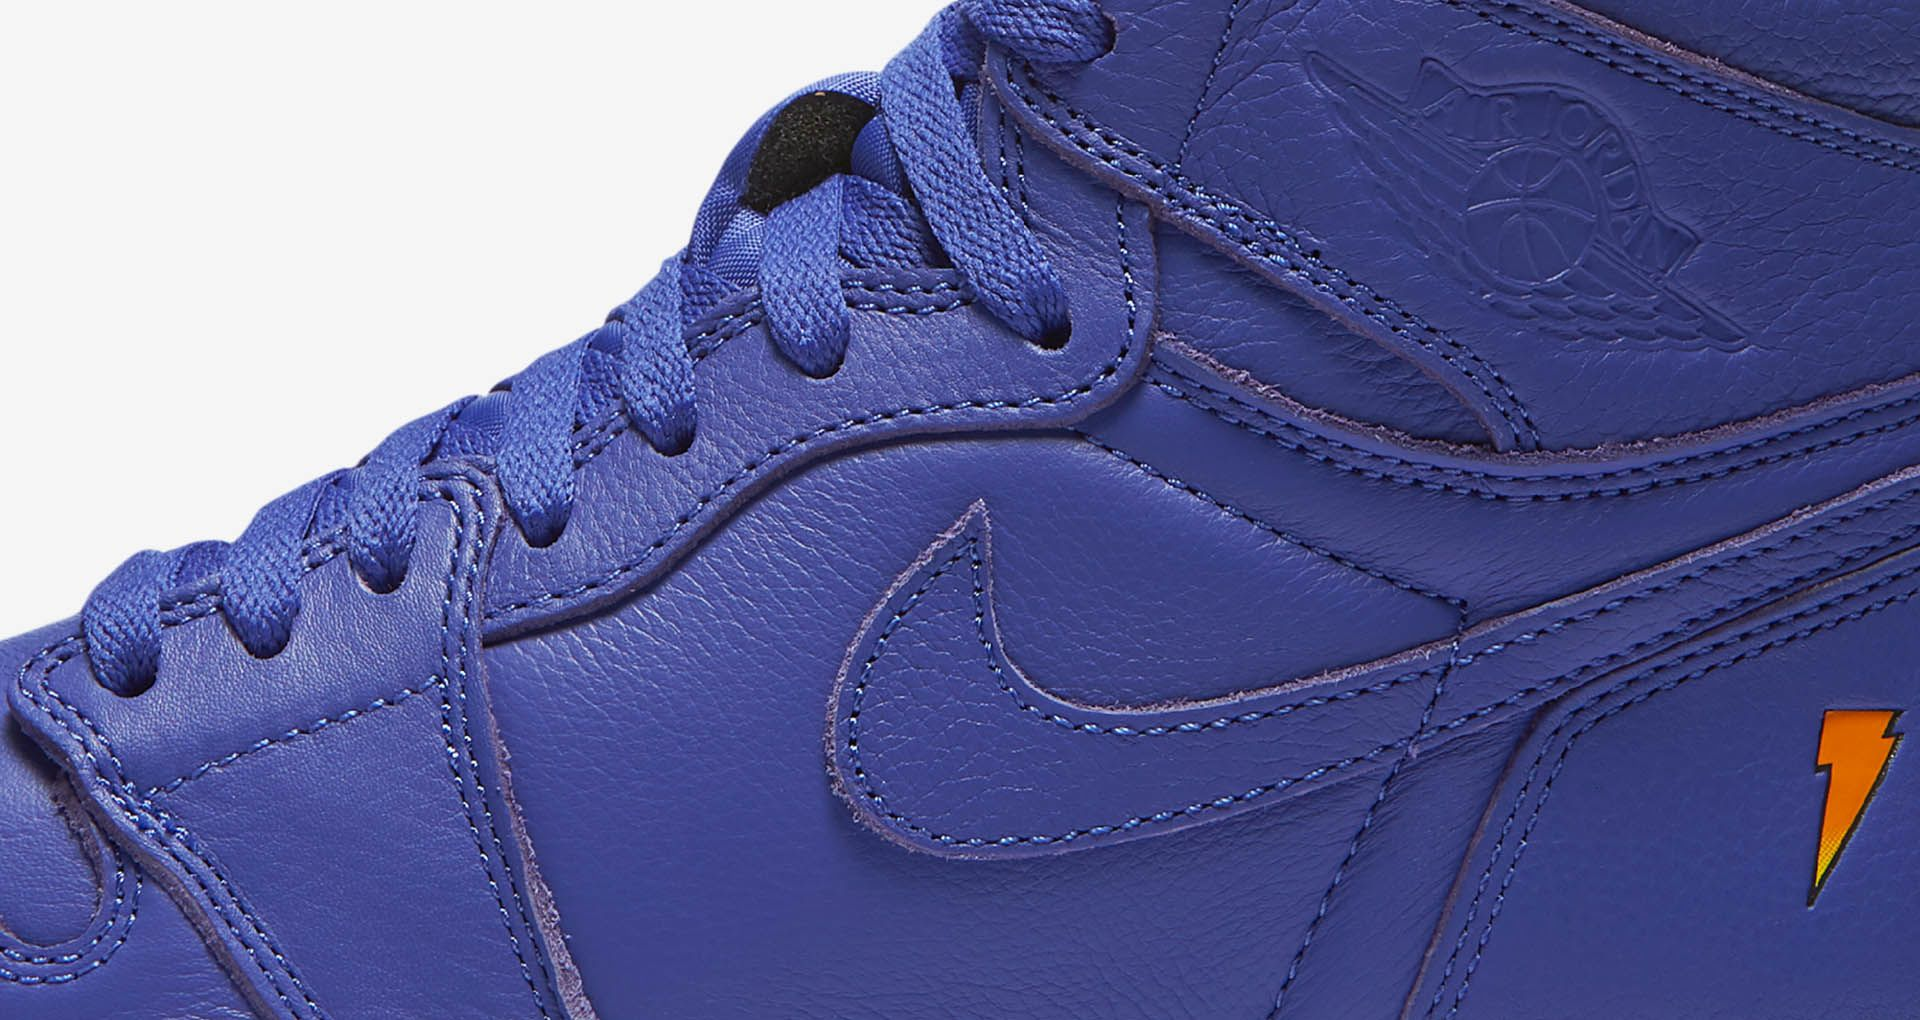 newest 7ff16 a9342 Air Jordan 1 High Gatorade 'Grape' Release Date. Nike+ SNKRS